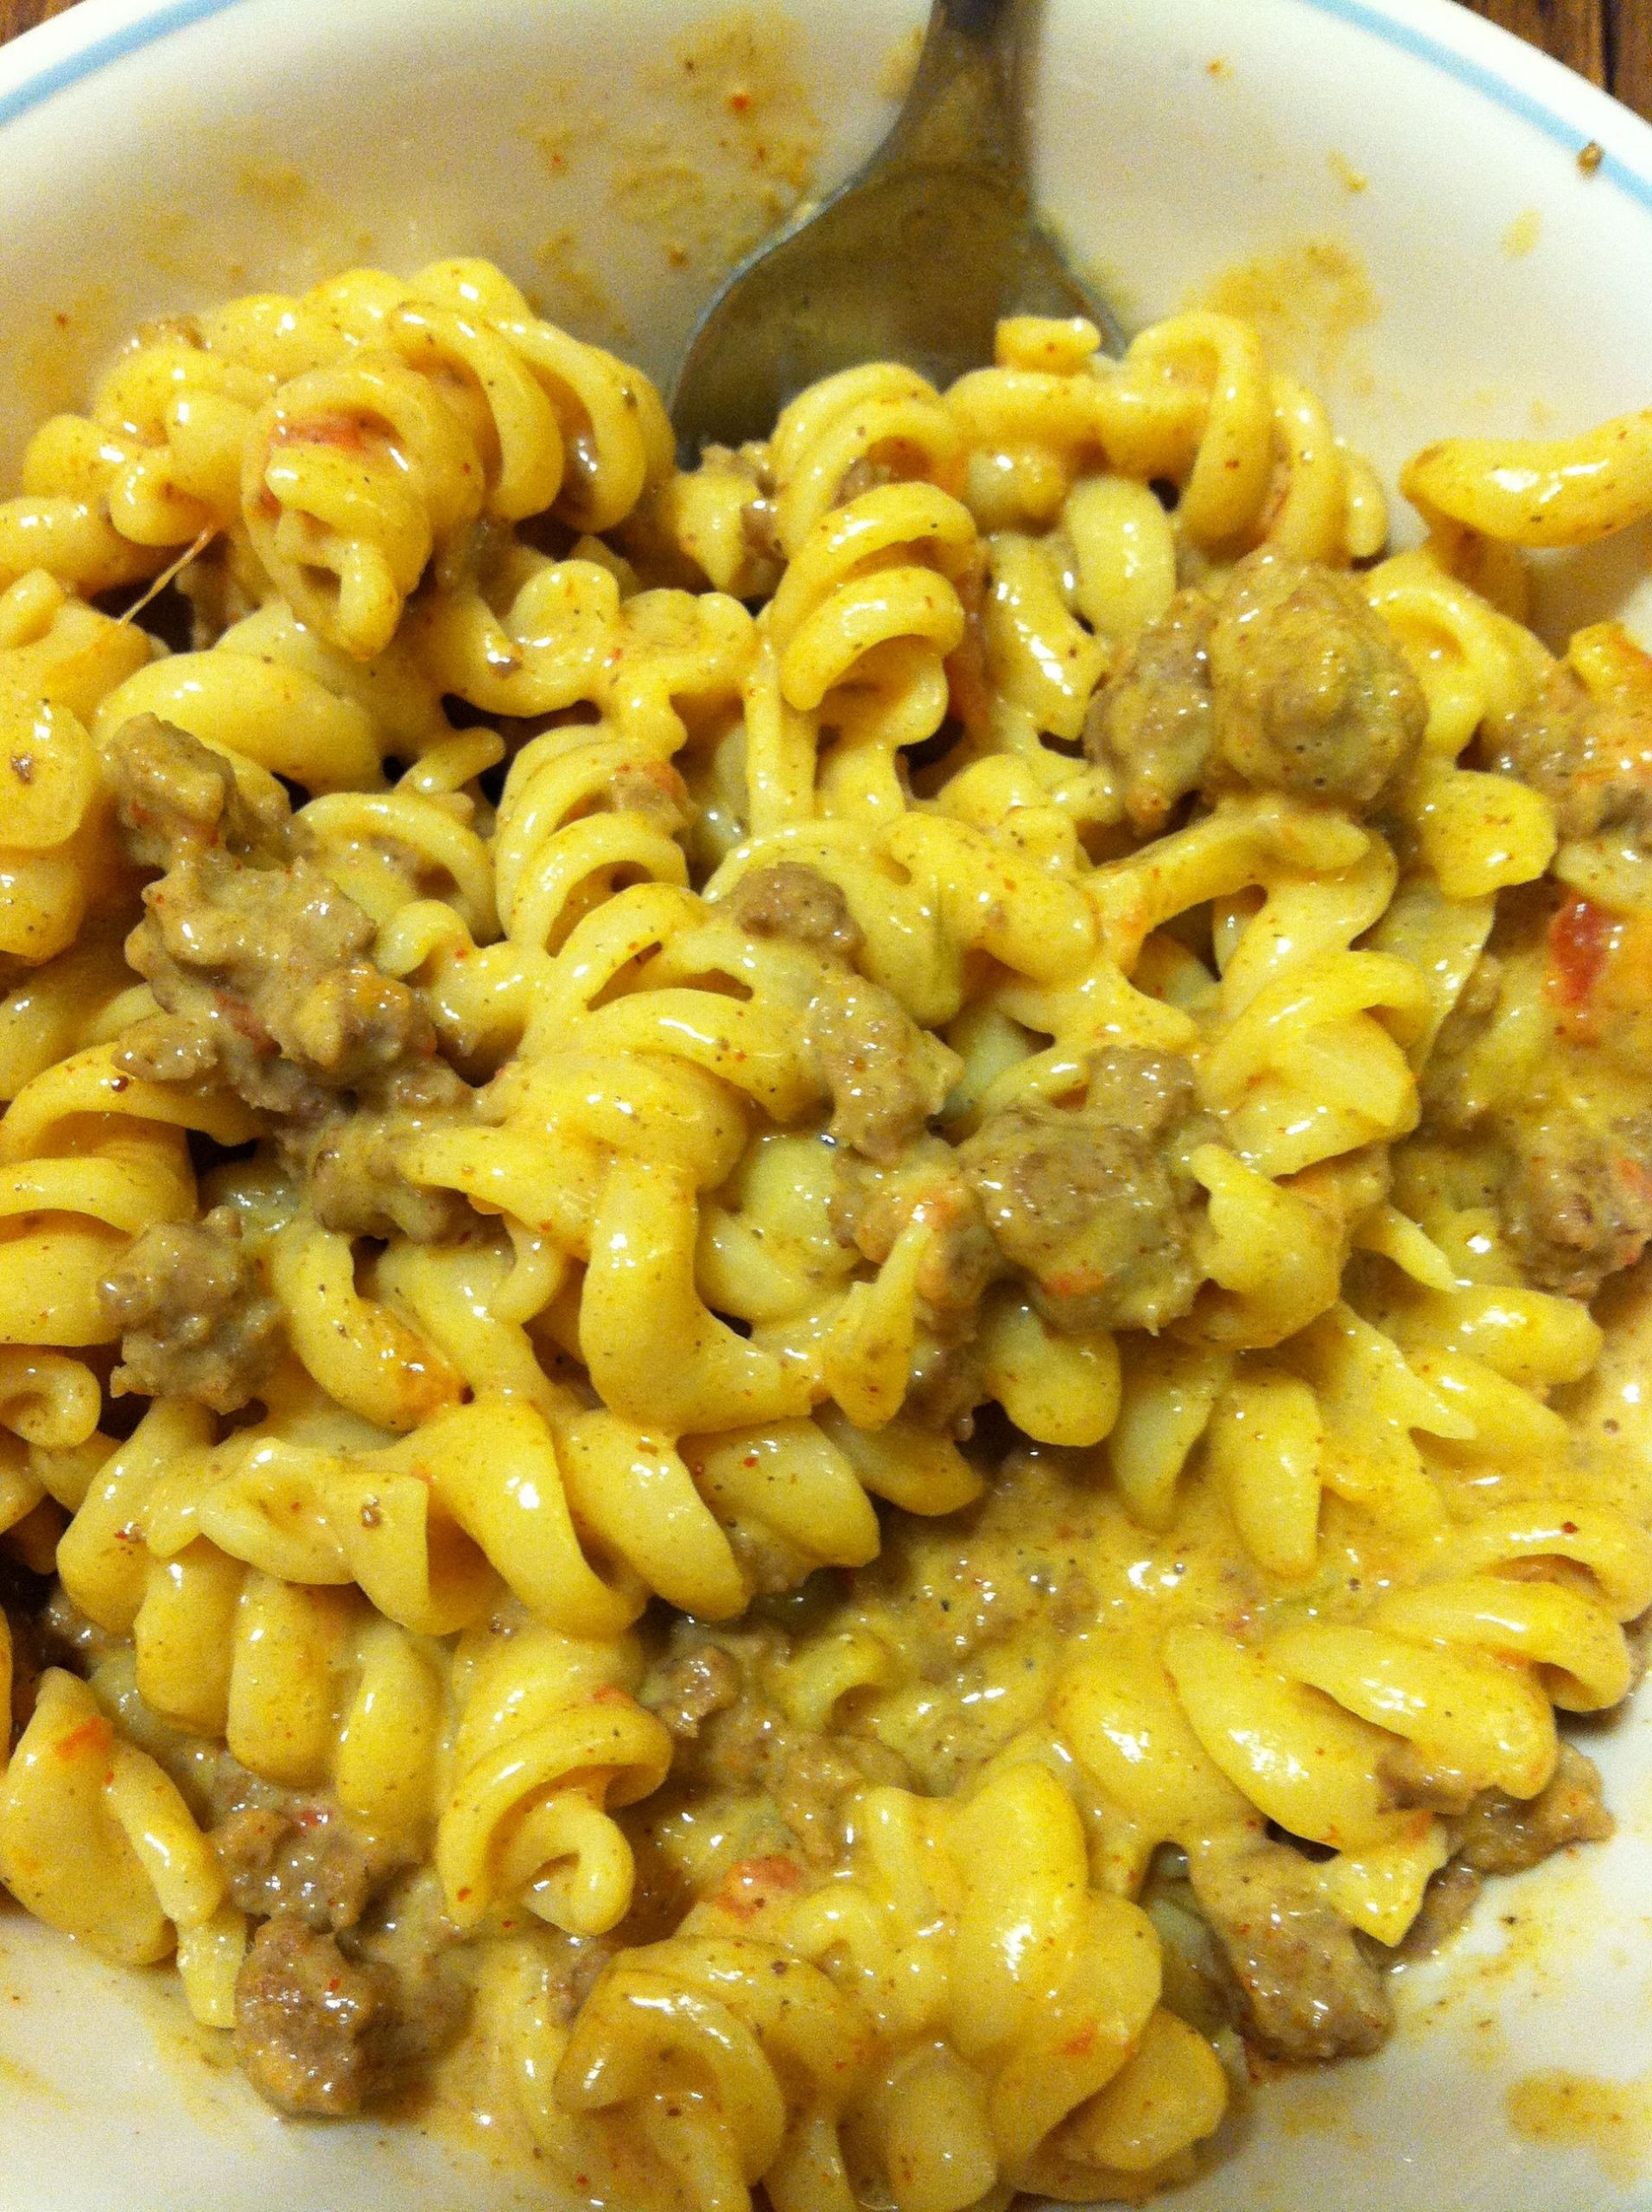 Velveeta Mac And Cheese Recipes With Ground Beef  recipes with ground beef pasta and velveeta cheese